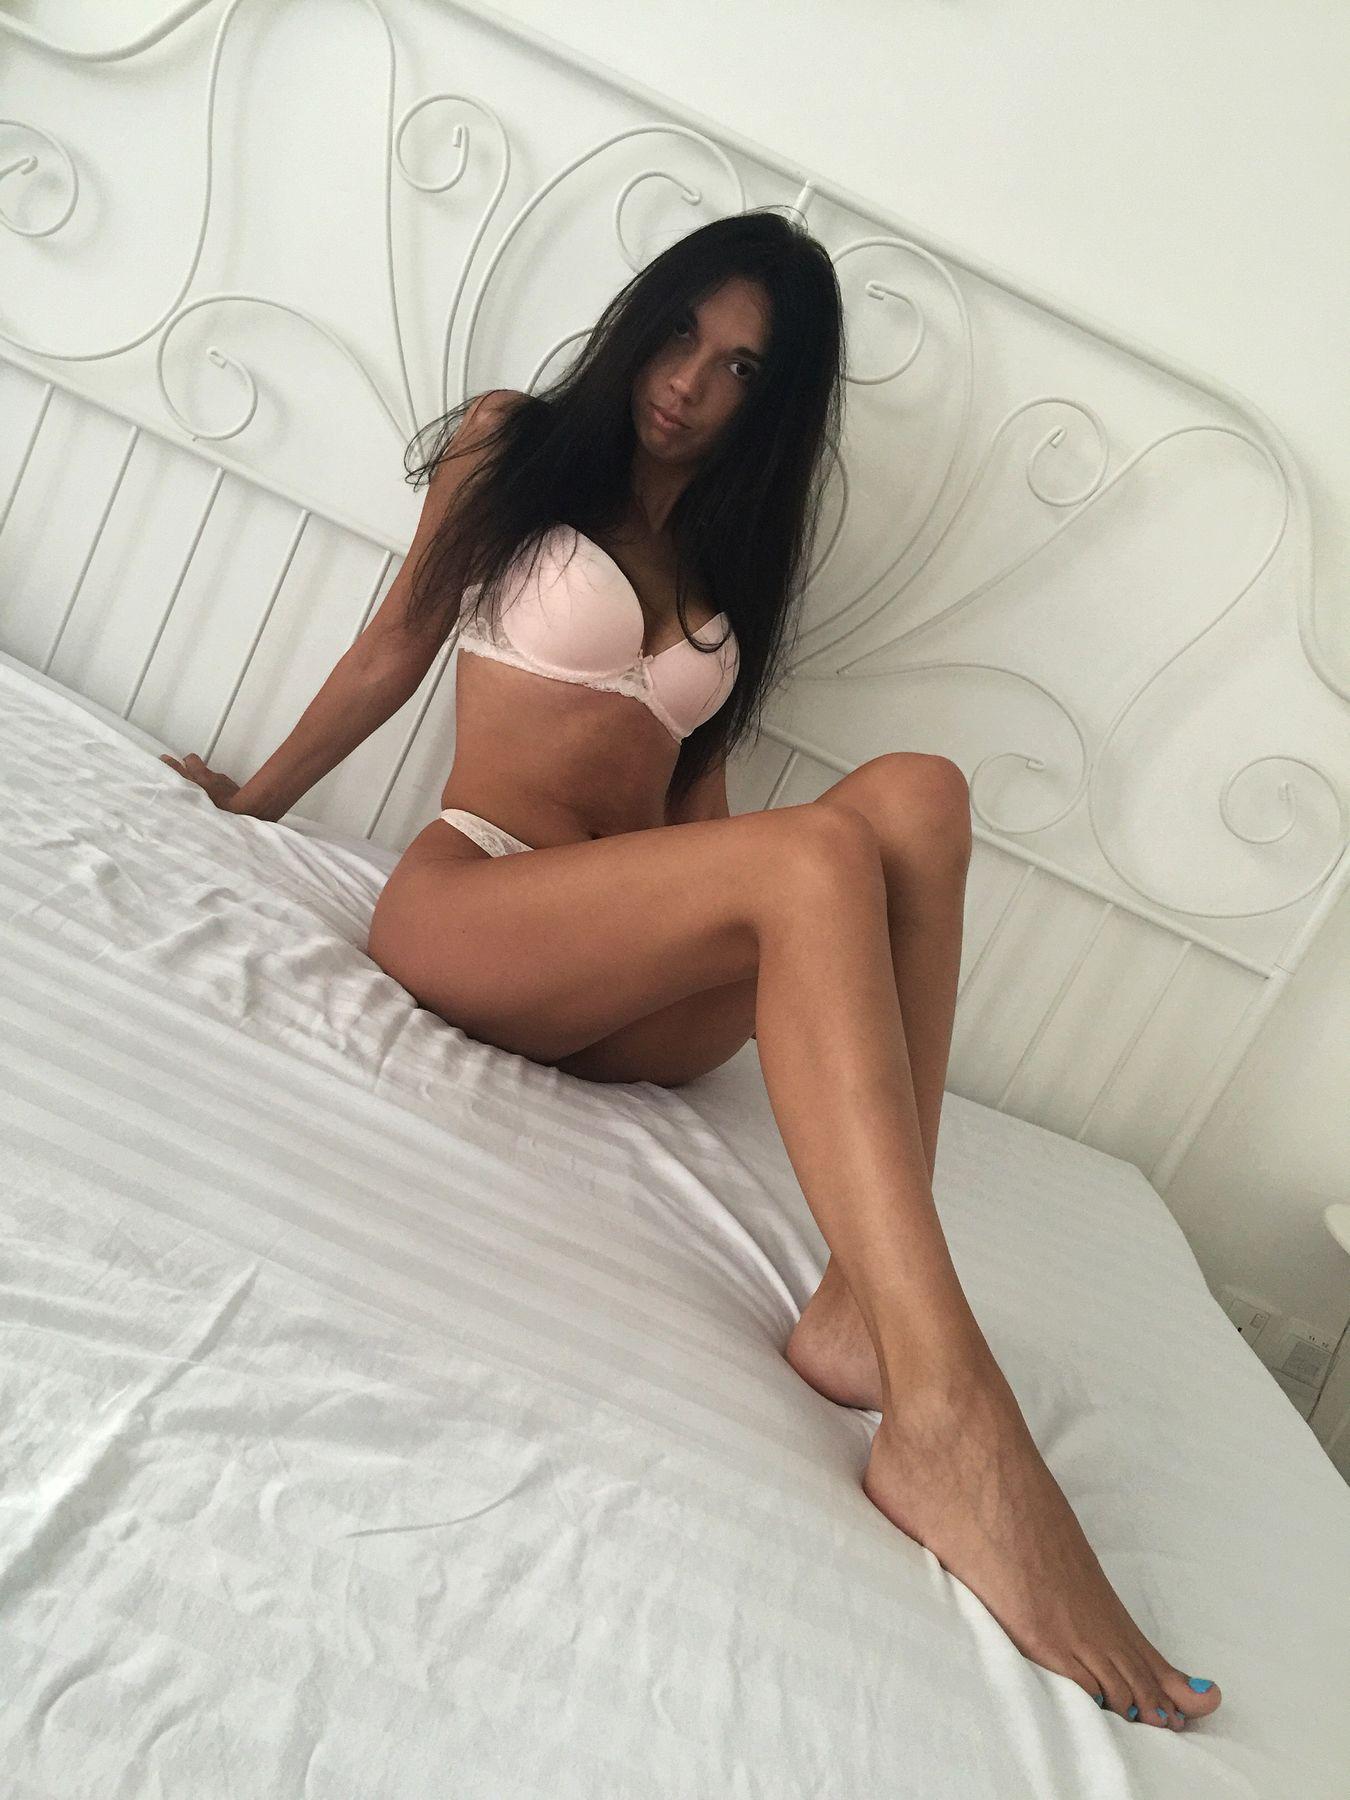 Bøsse massage sex dk escort i viborg